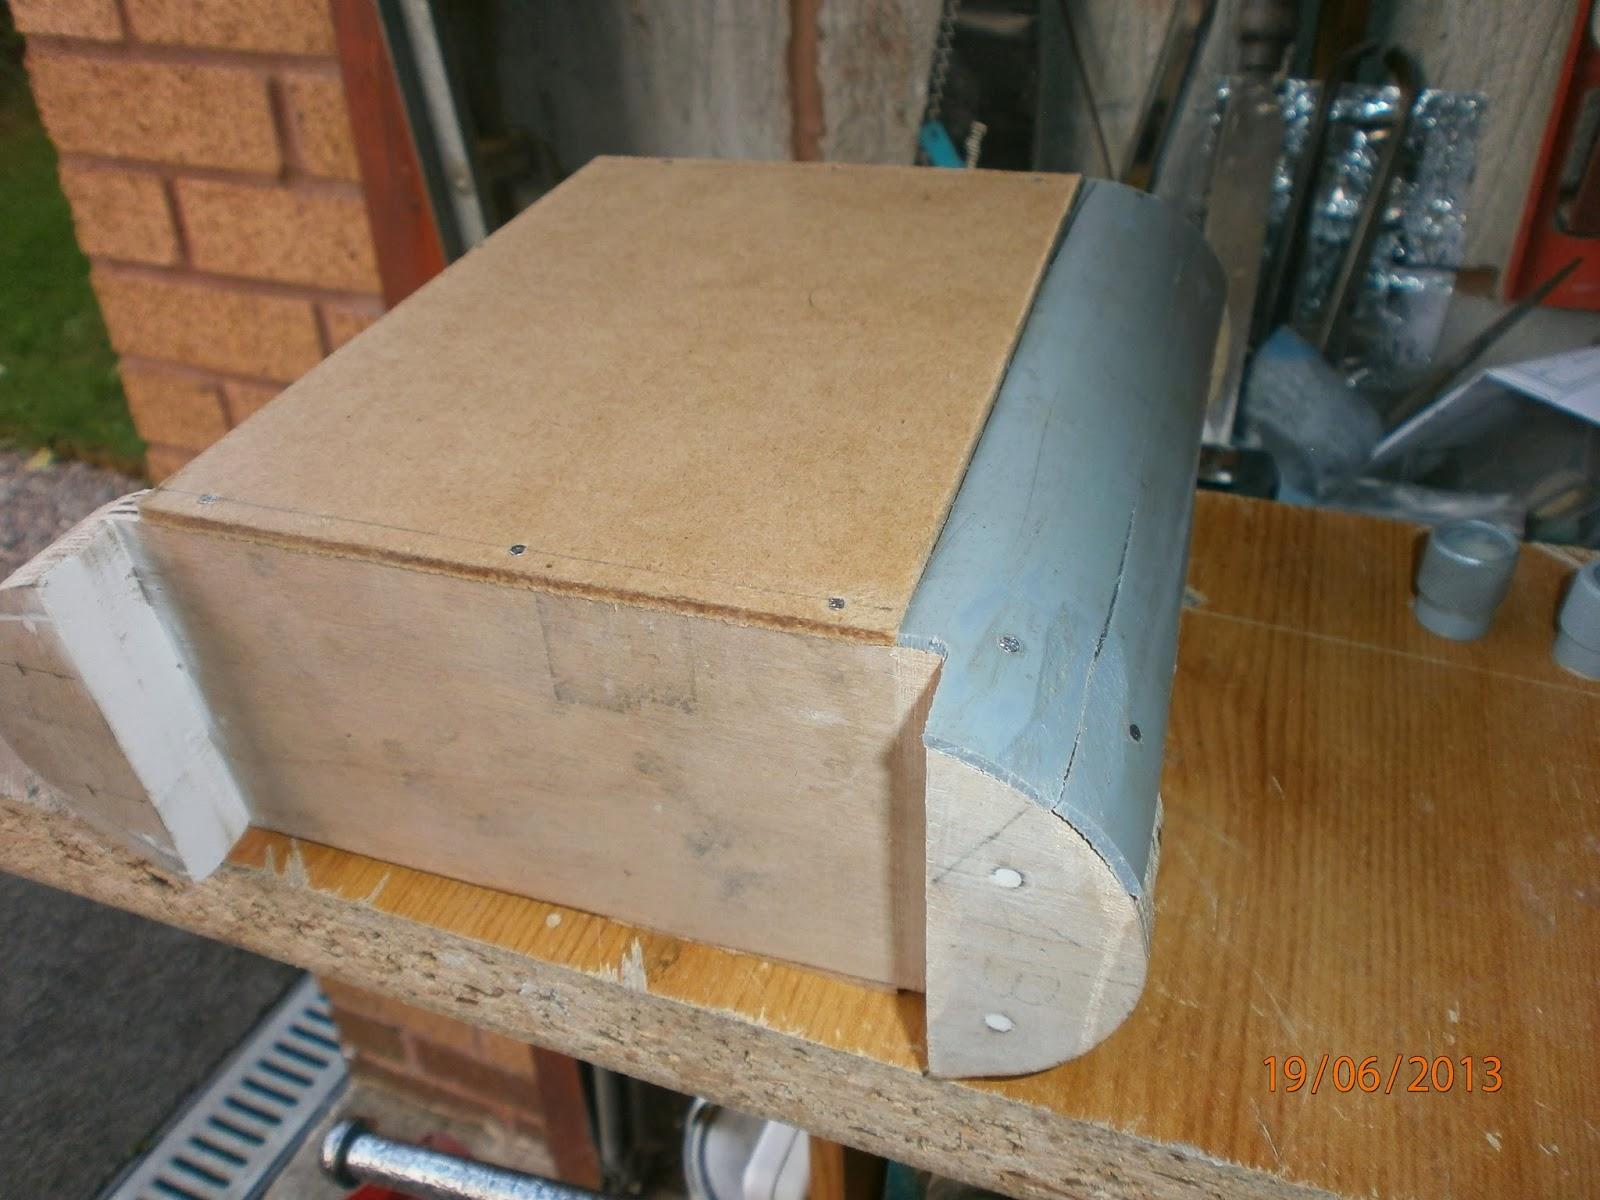 R5D4 R2D2 Battery Box